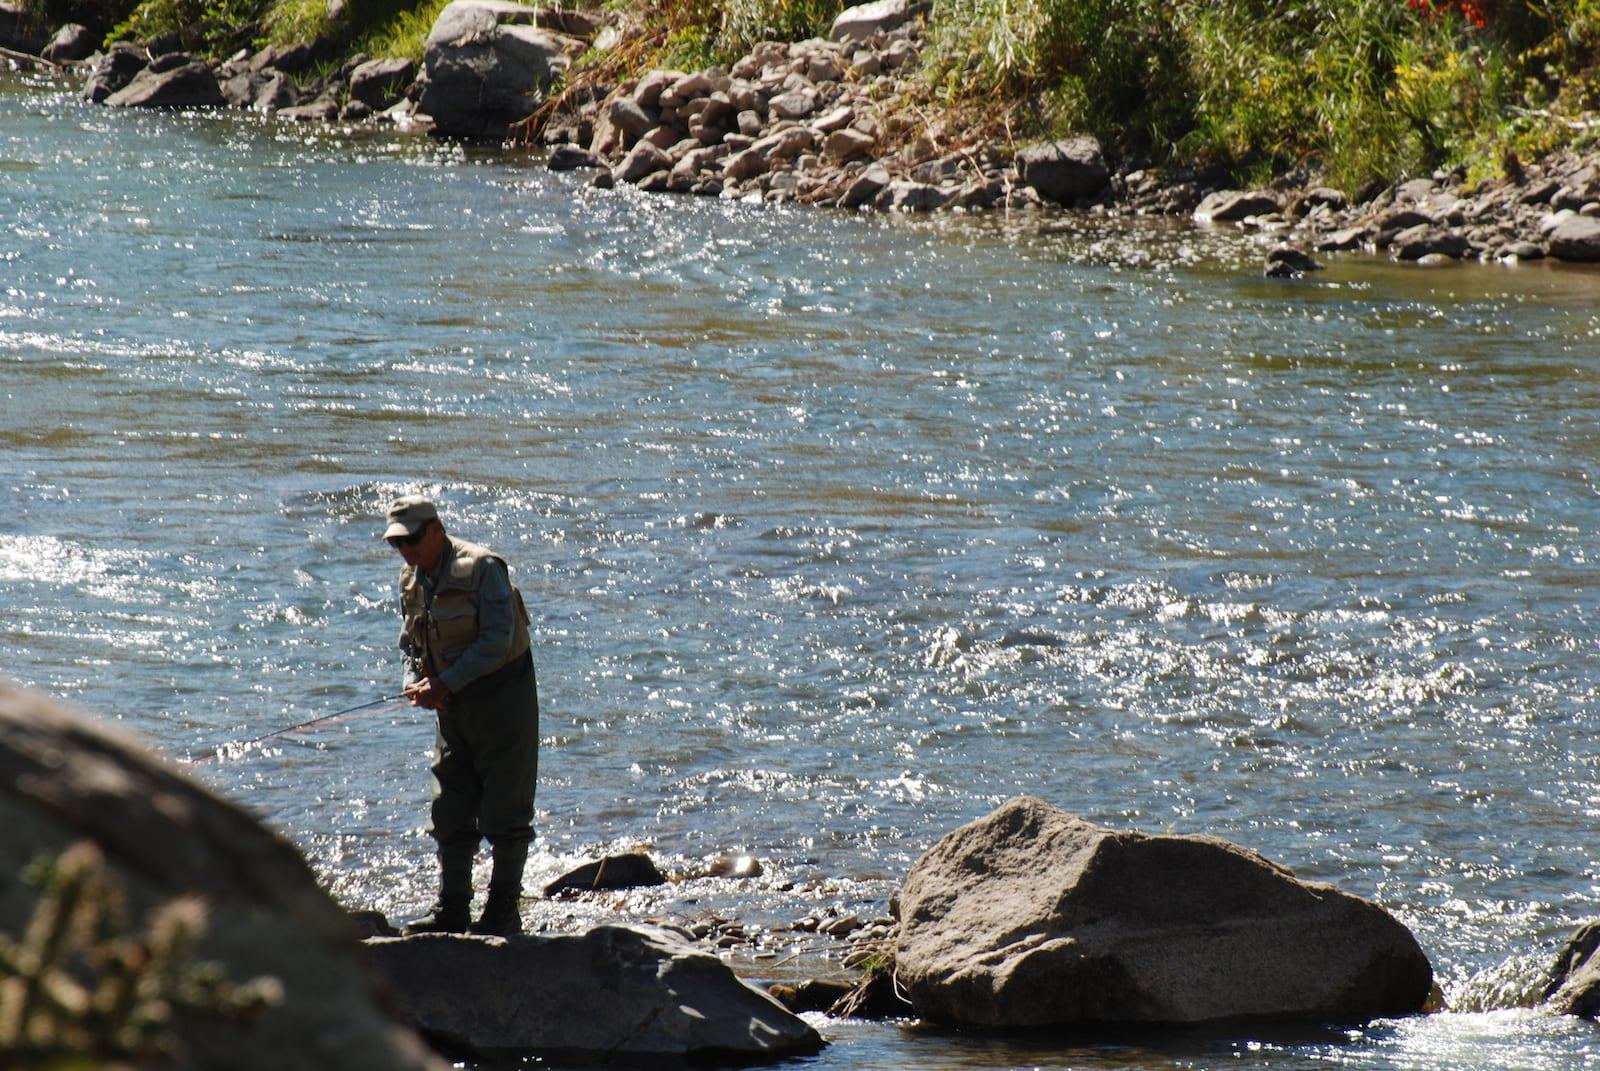 Angler Fishing on Arkansas River Echo Colorado